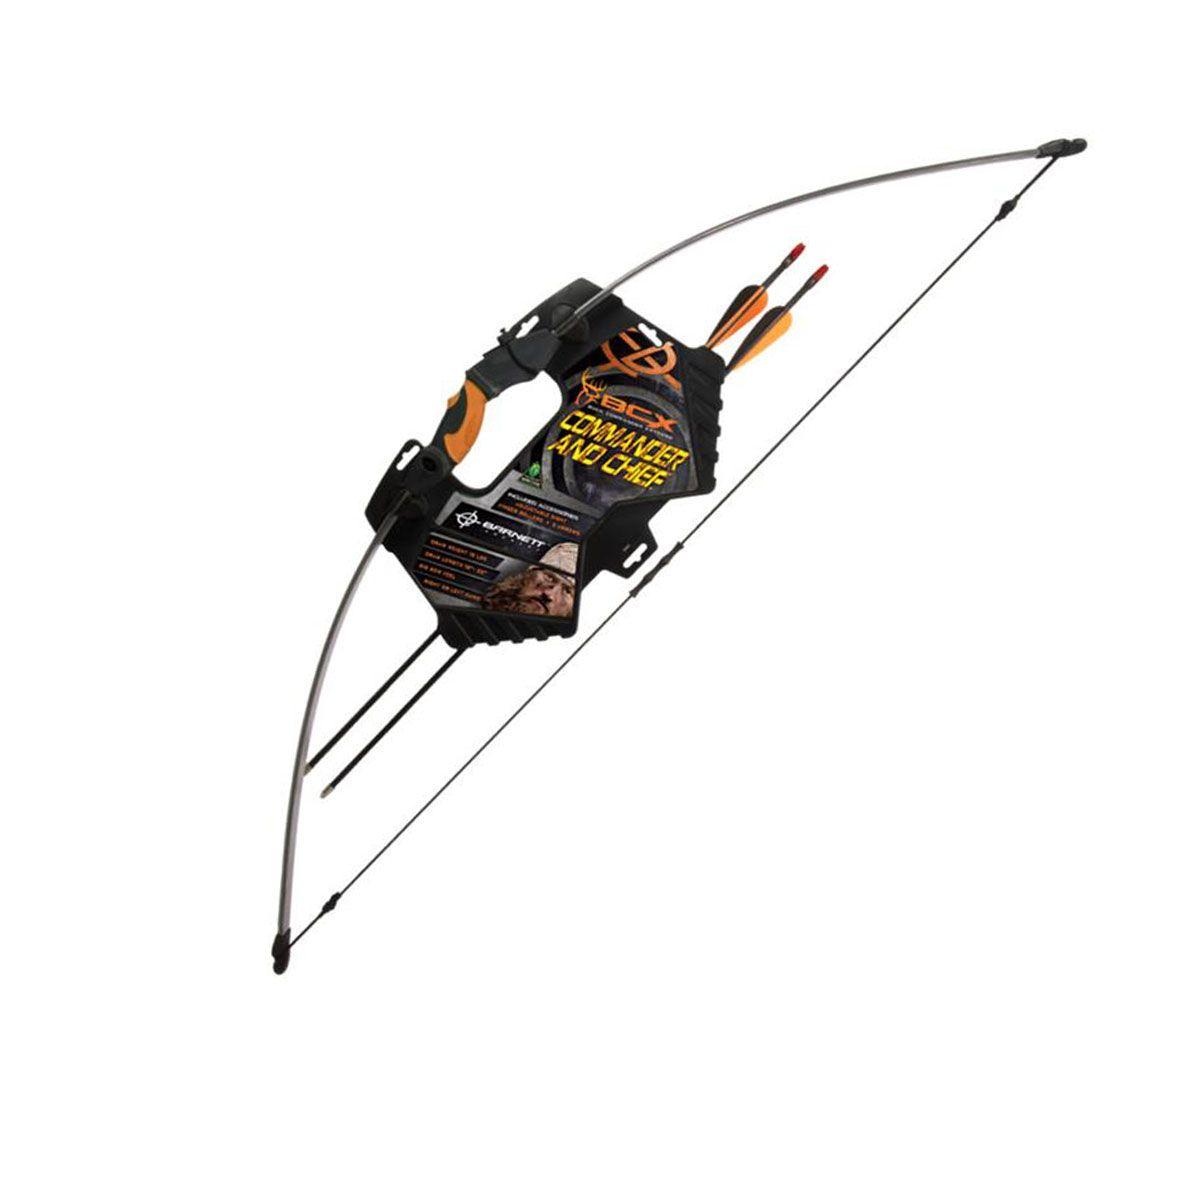 Arco Barnett Commader Lil`Sioux 15Lb c/ 2 Flechas de 20